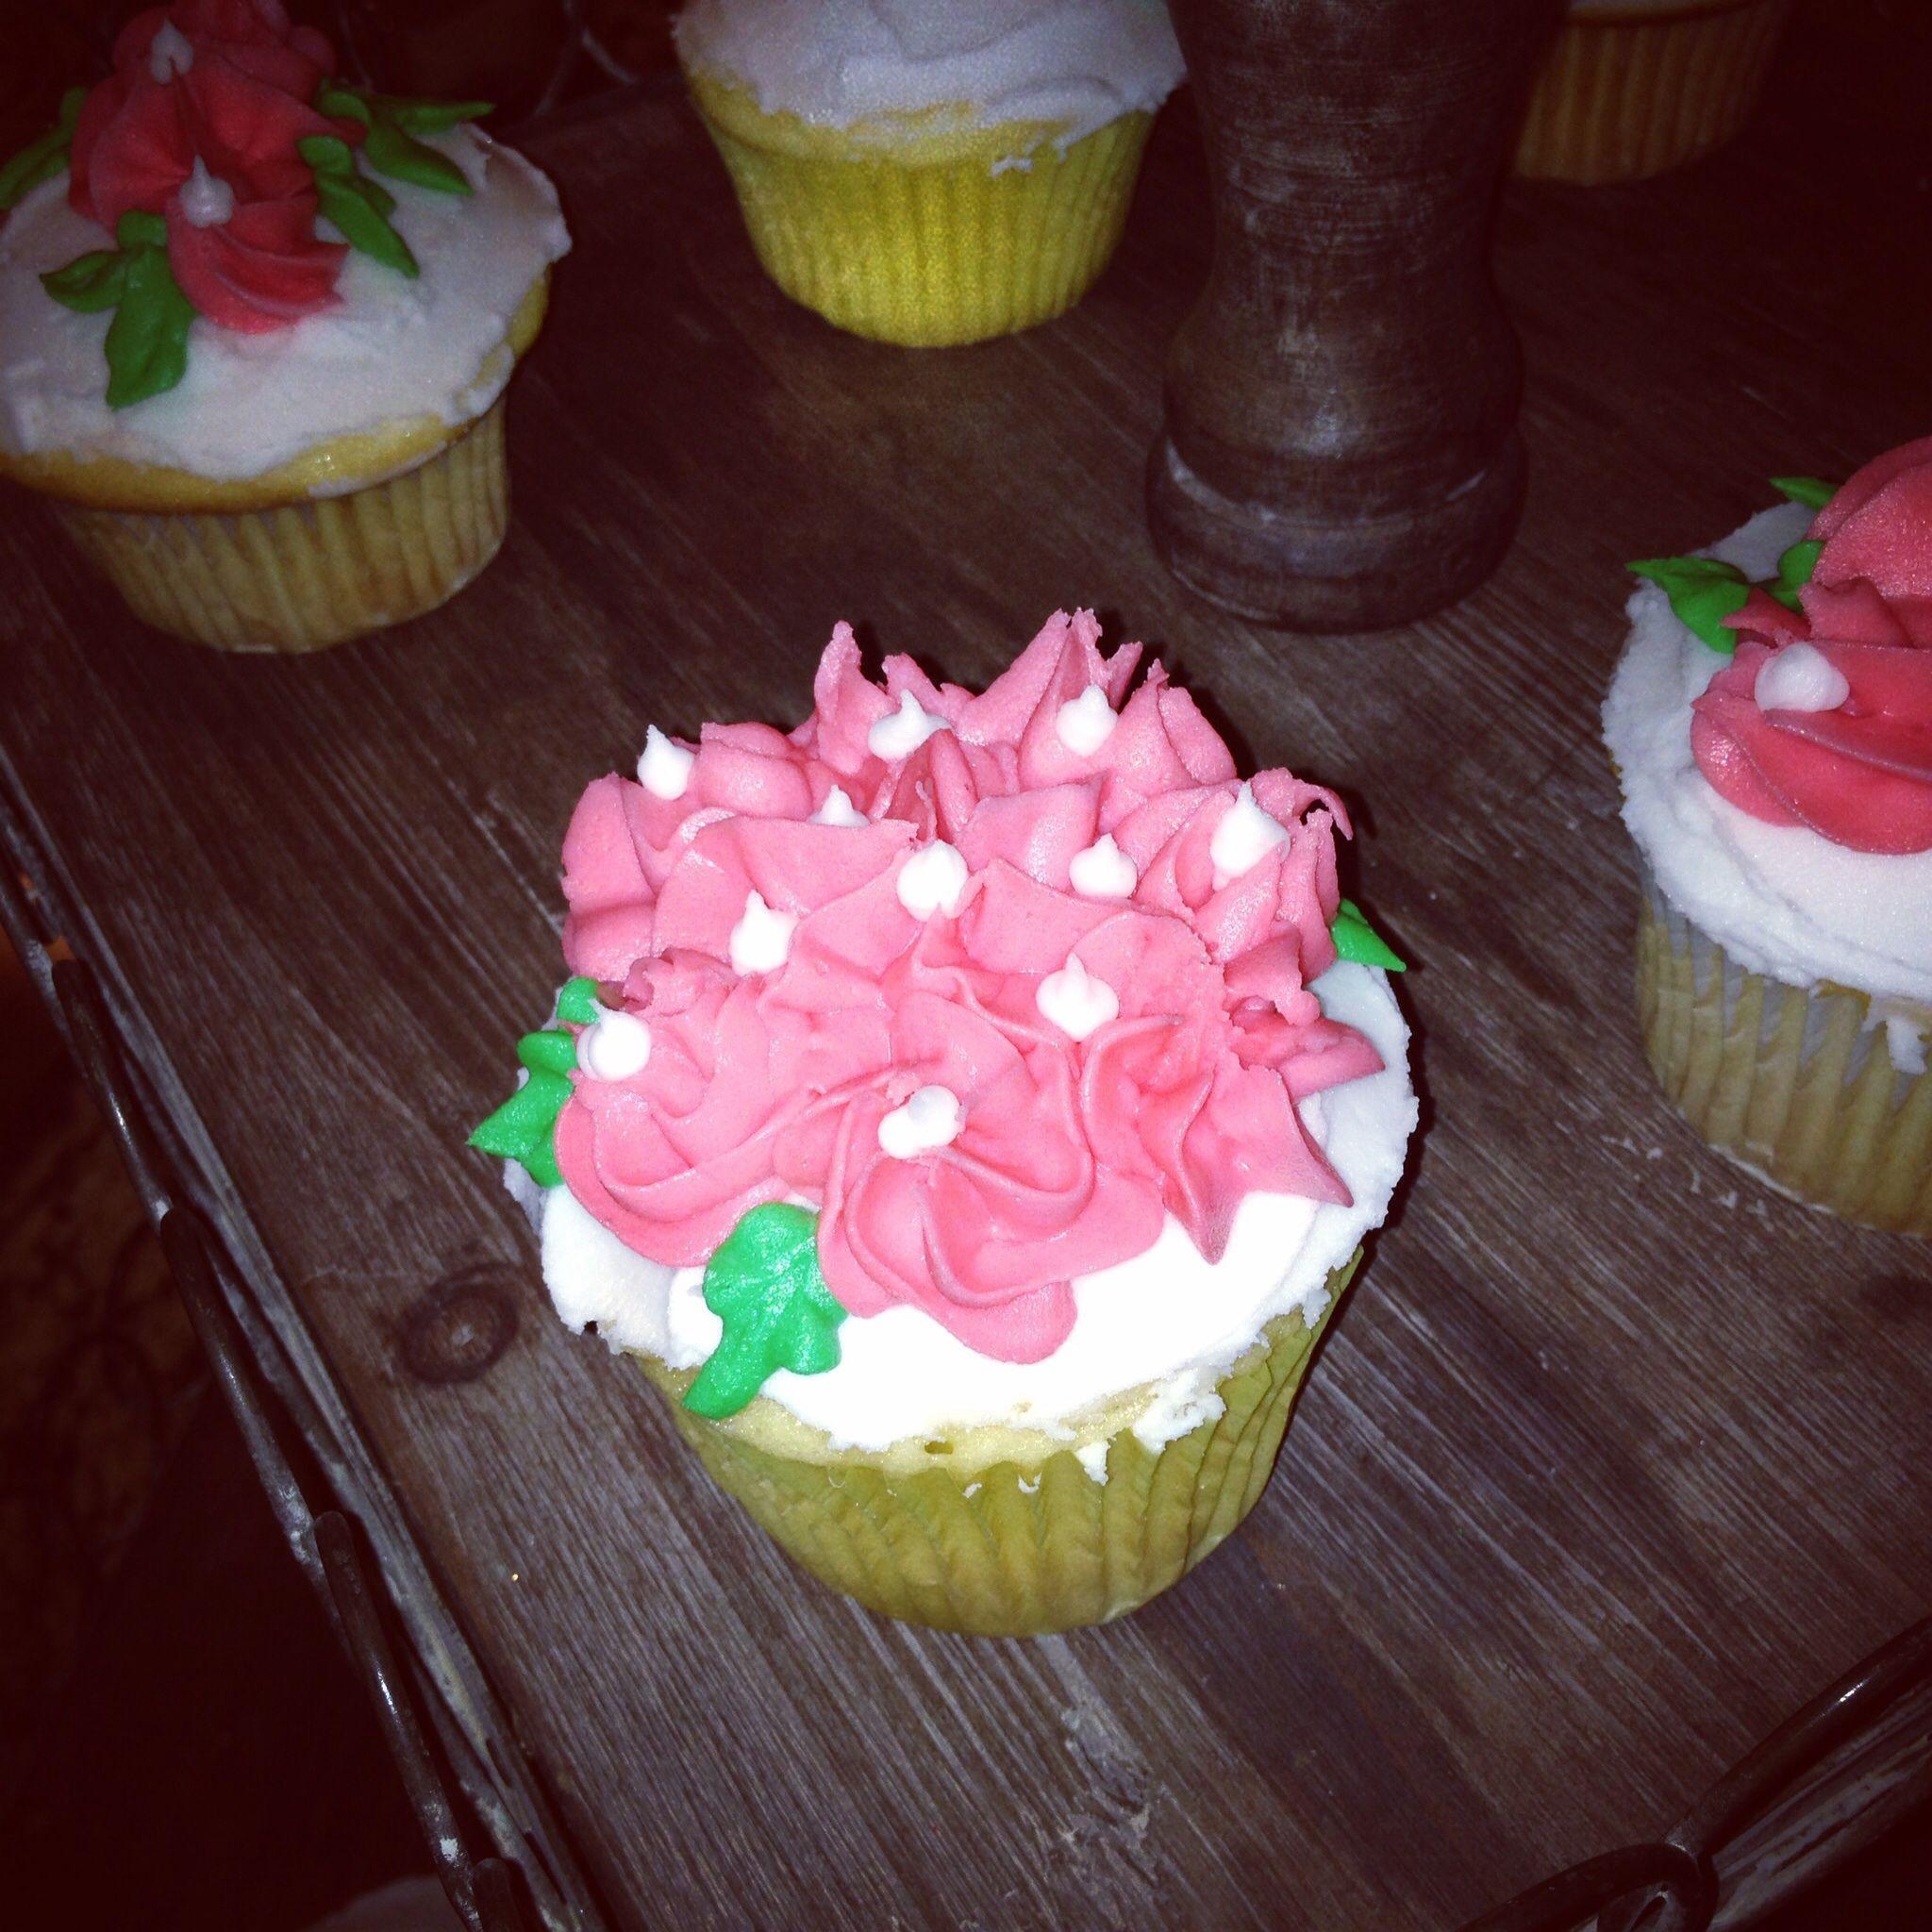 Floral cupcake design